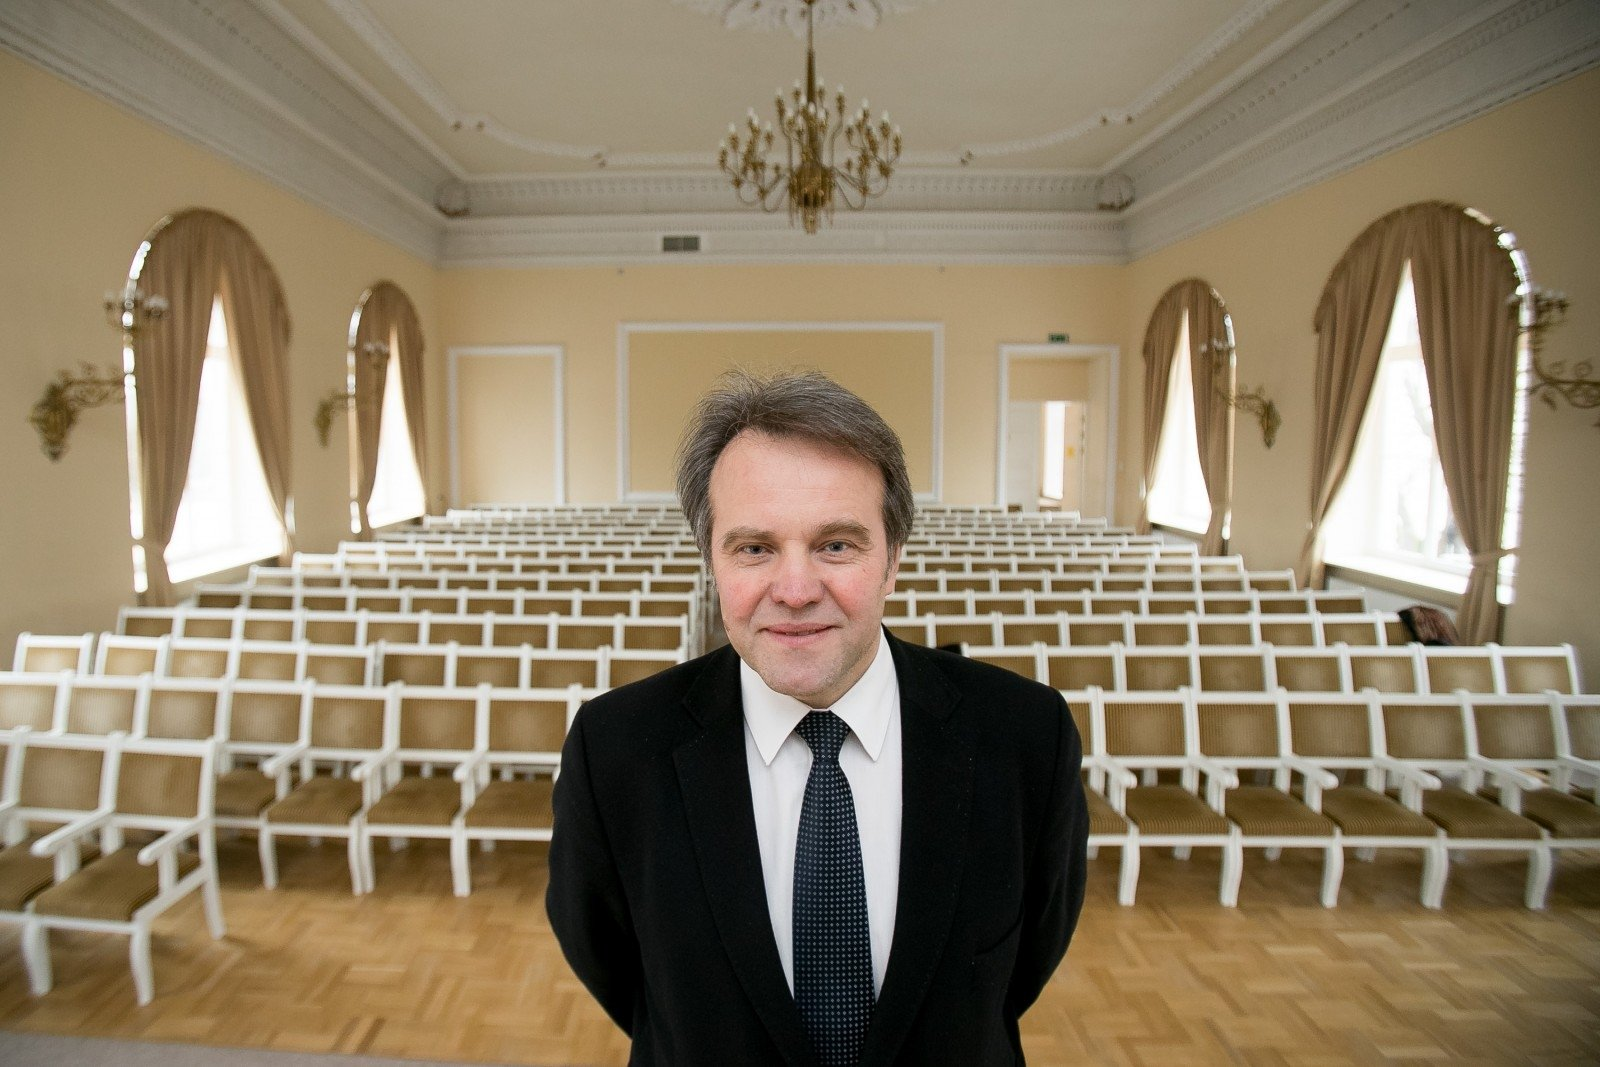 Birutė Vainiūnaitė - Vytautas Montvila Montvila Lietuvos Fortepijoninė Muzika 2 / Lithuanian Piano Music 2